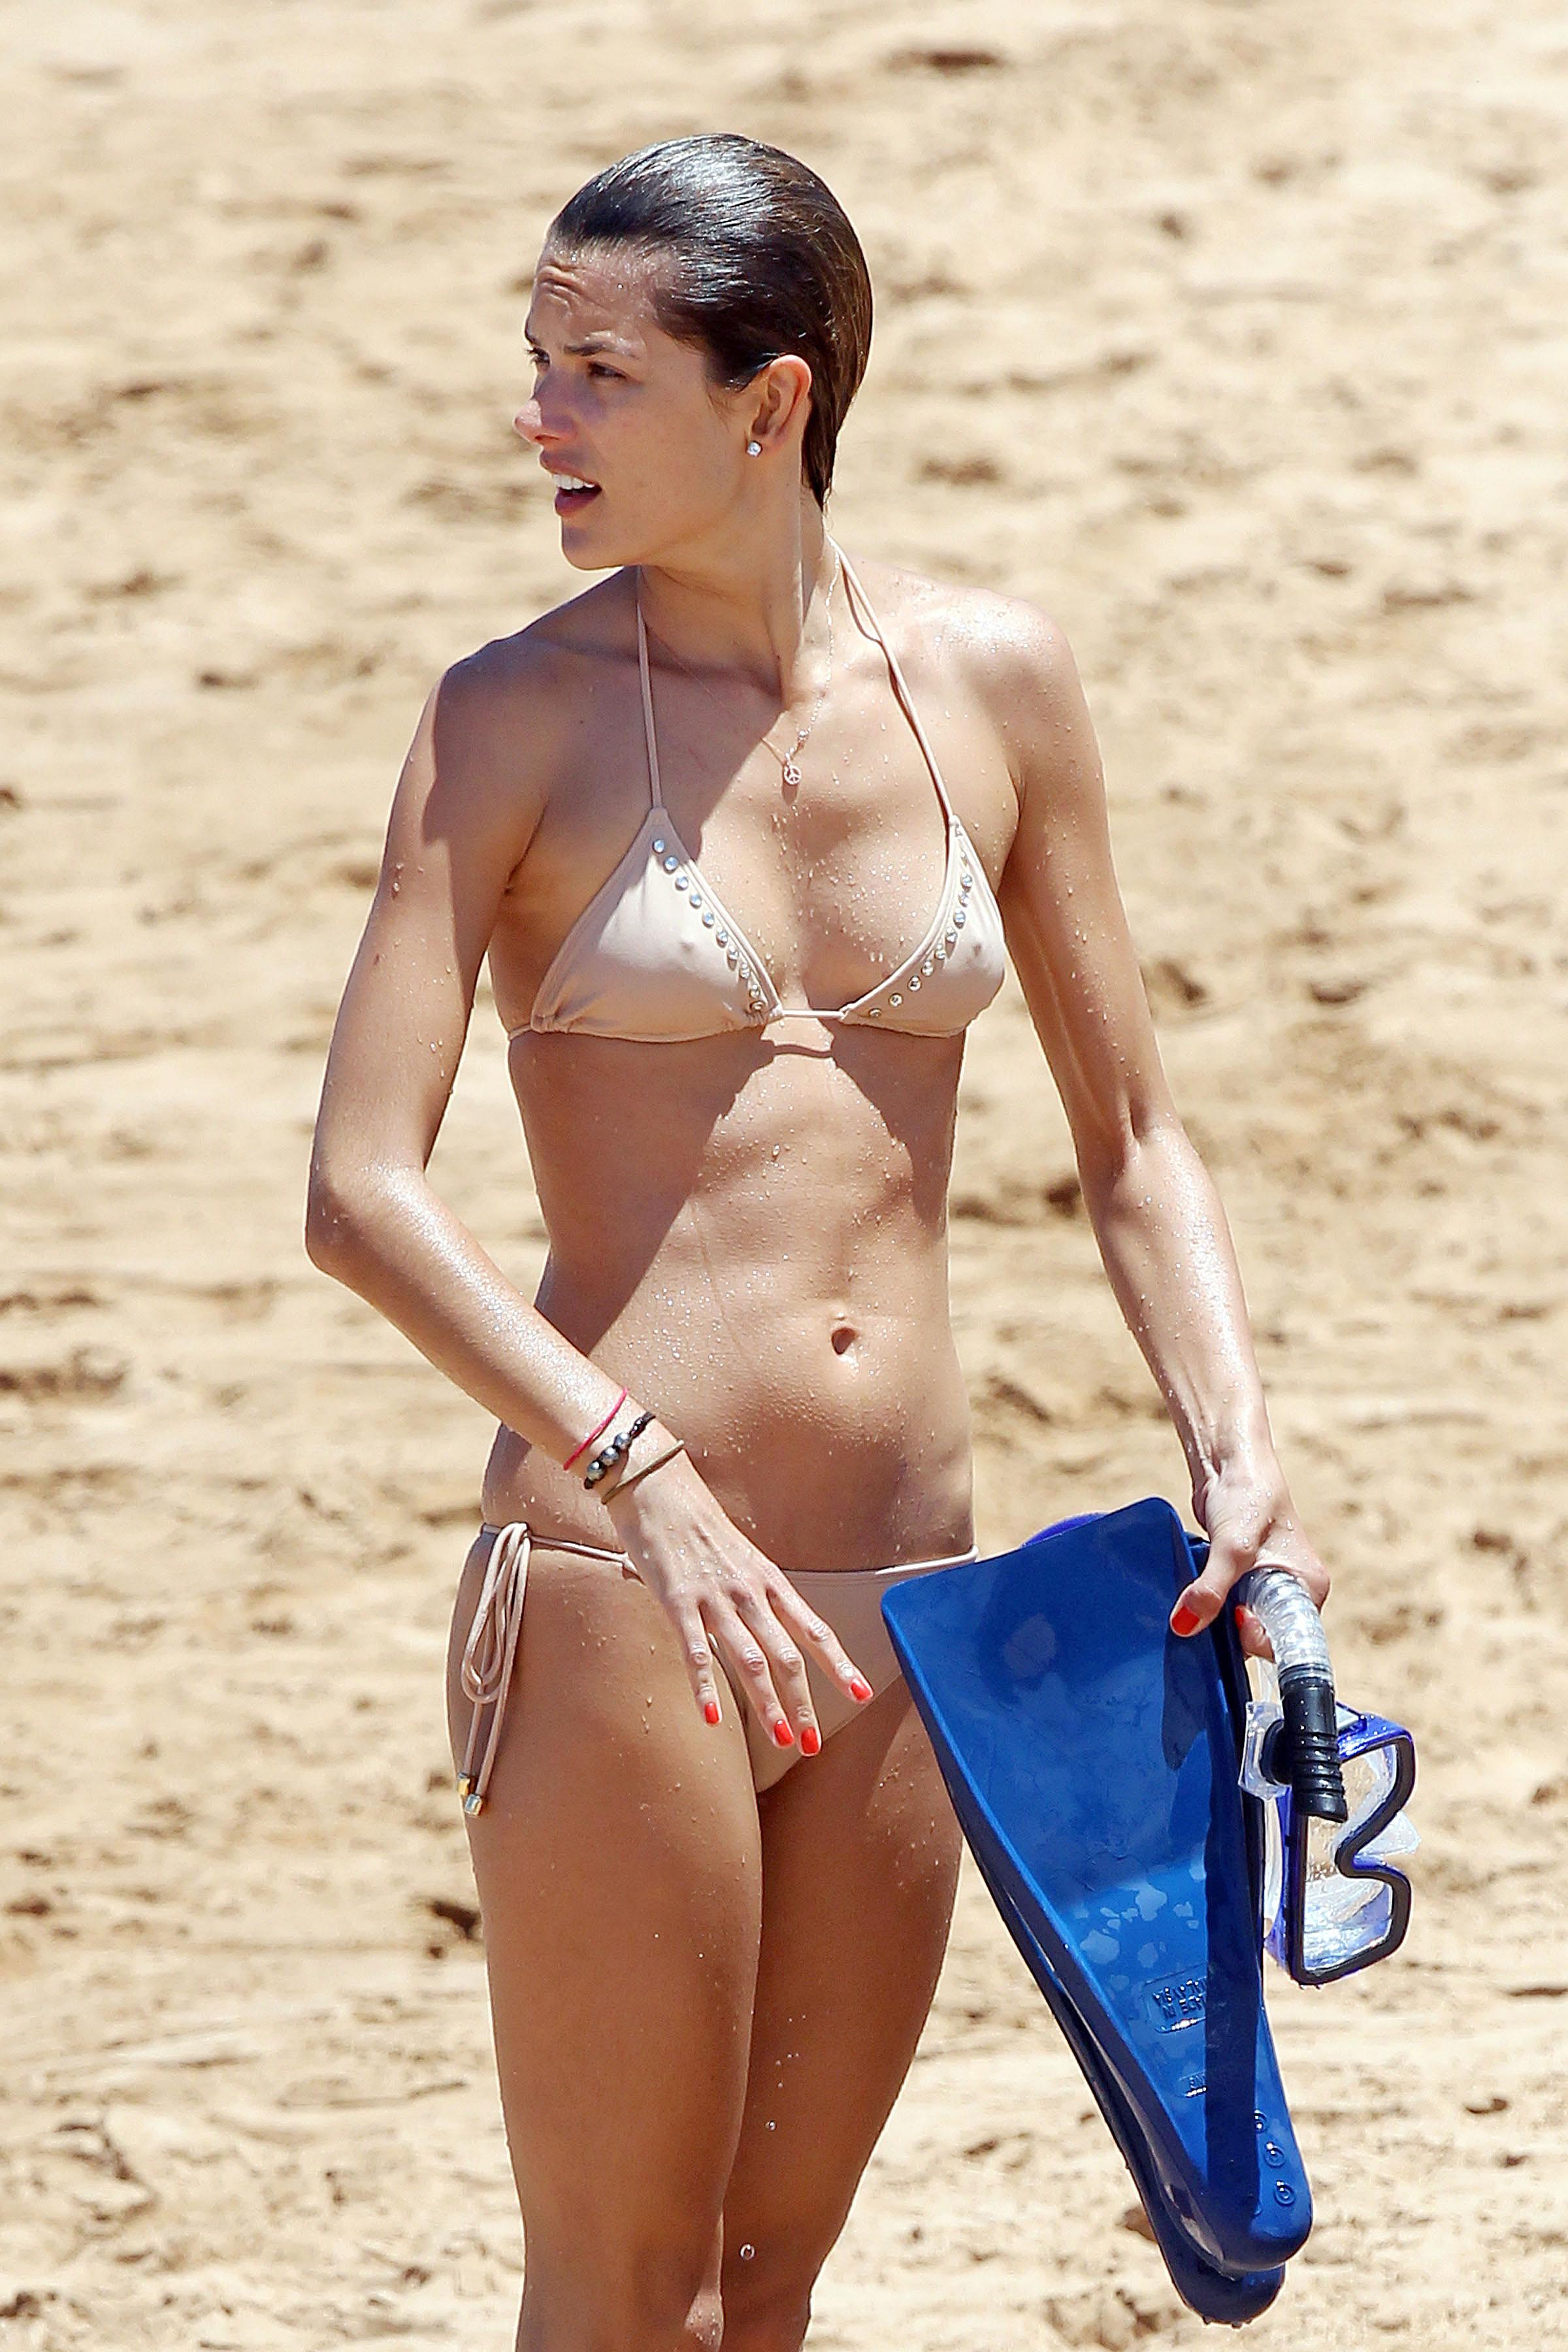 79936_Alessandra_Ambrosio_on_the_beach_in_Hawaii_10_122_468lo.jpg